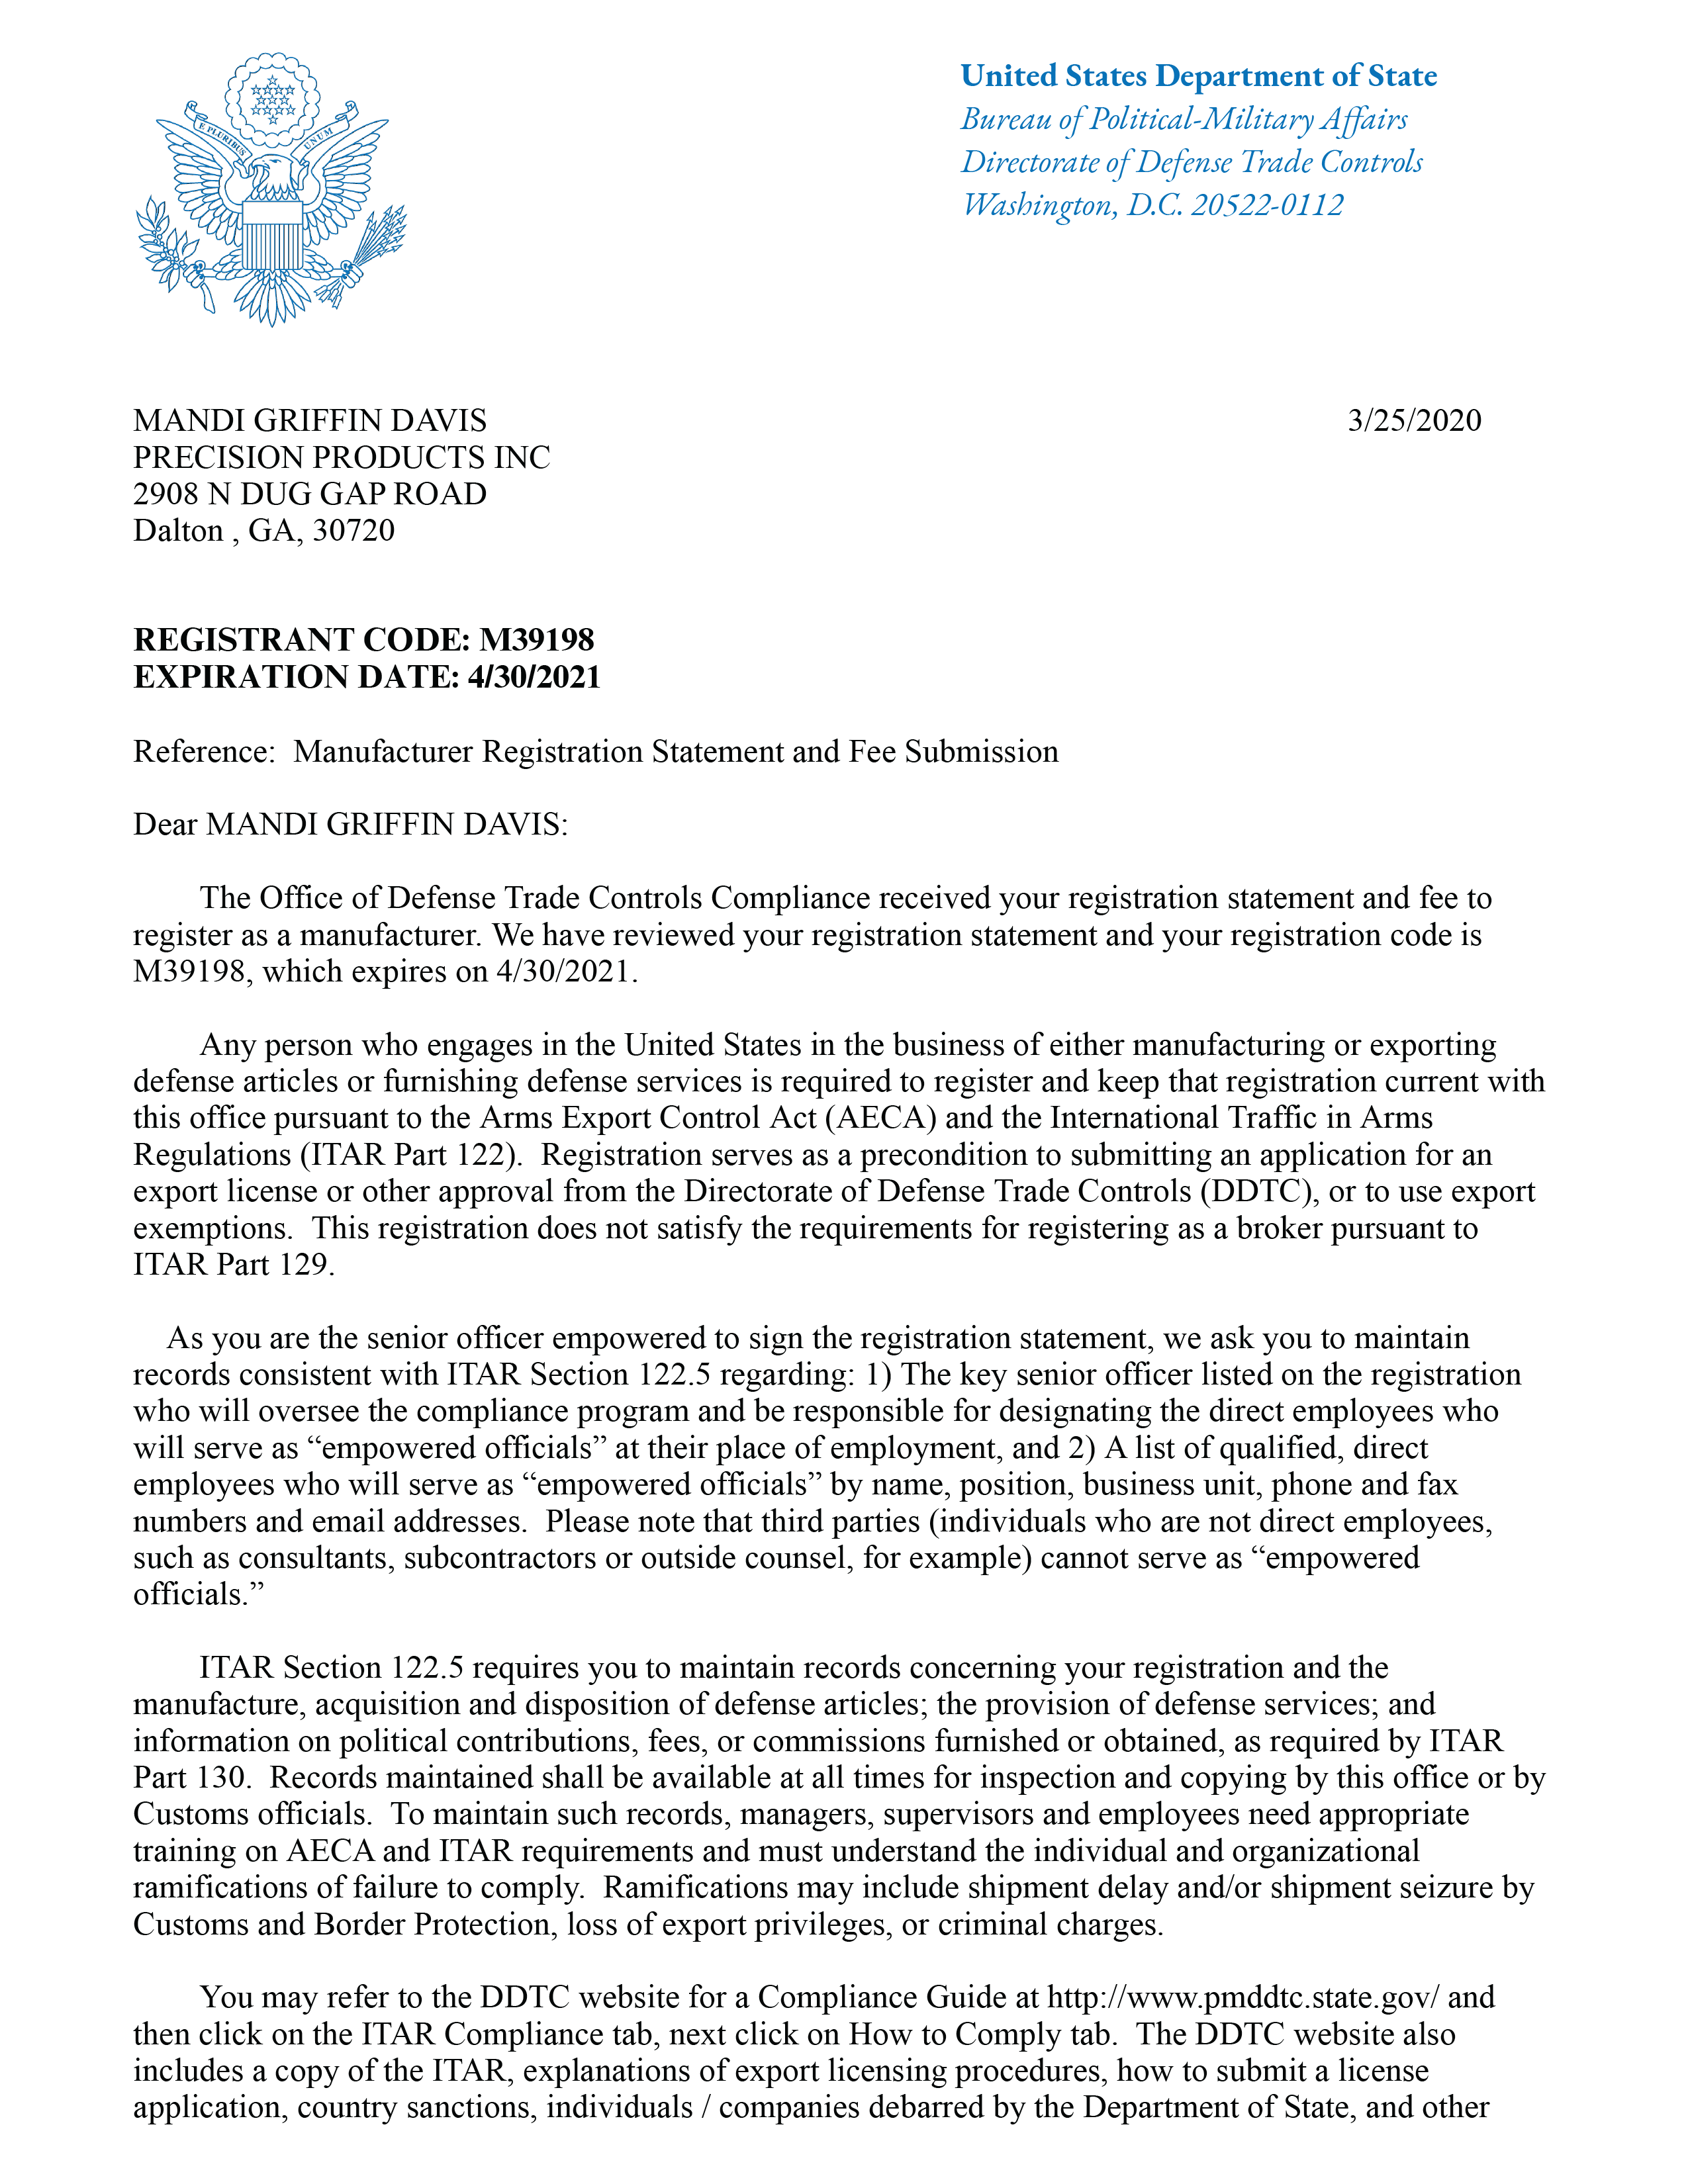 ITAR_Regulation_Letter_M39198-01